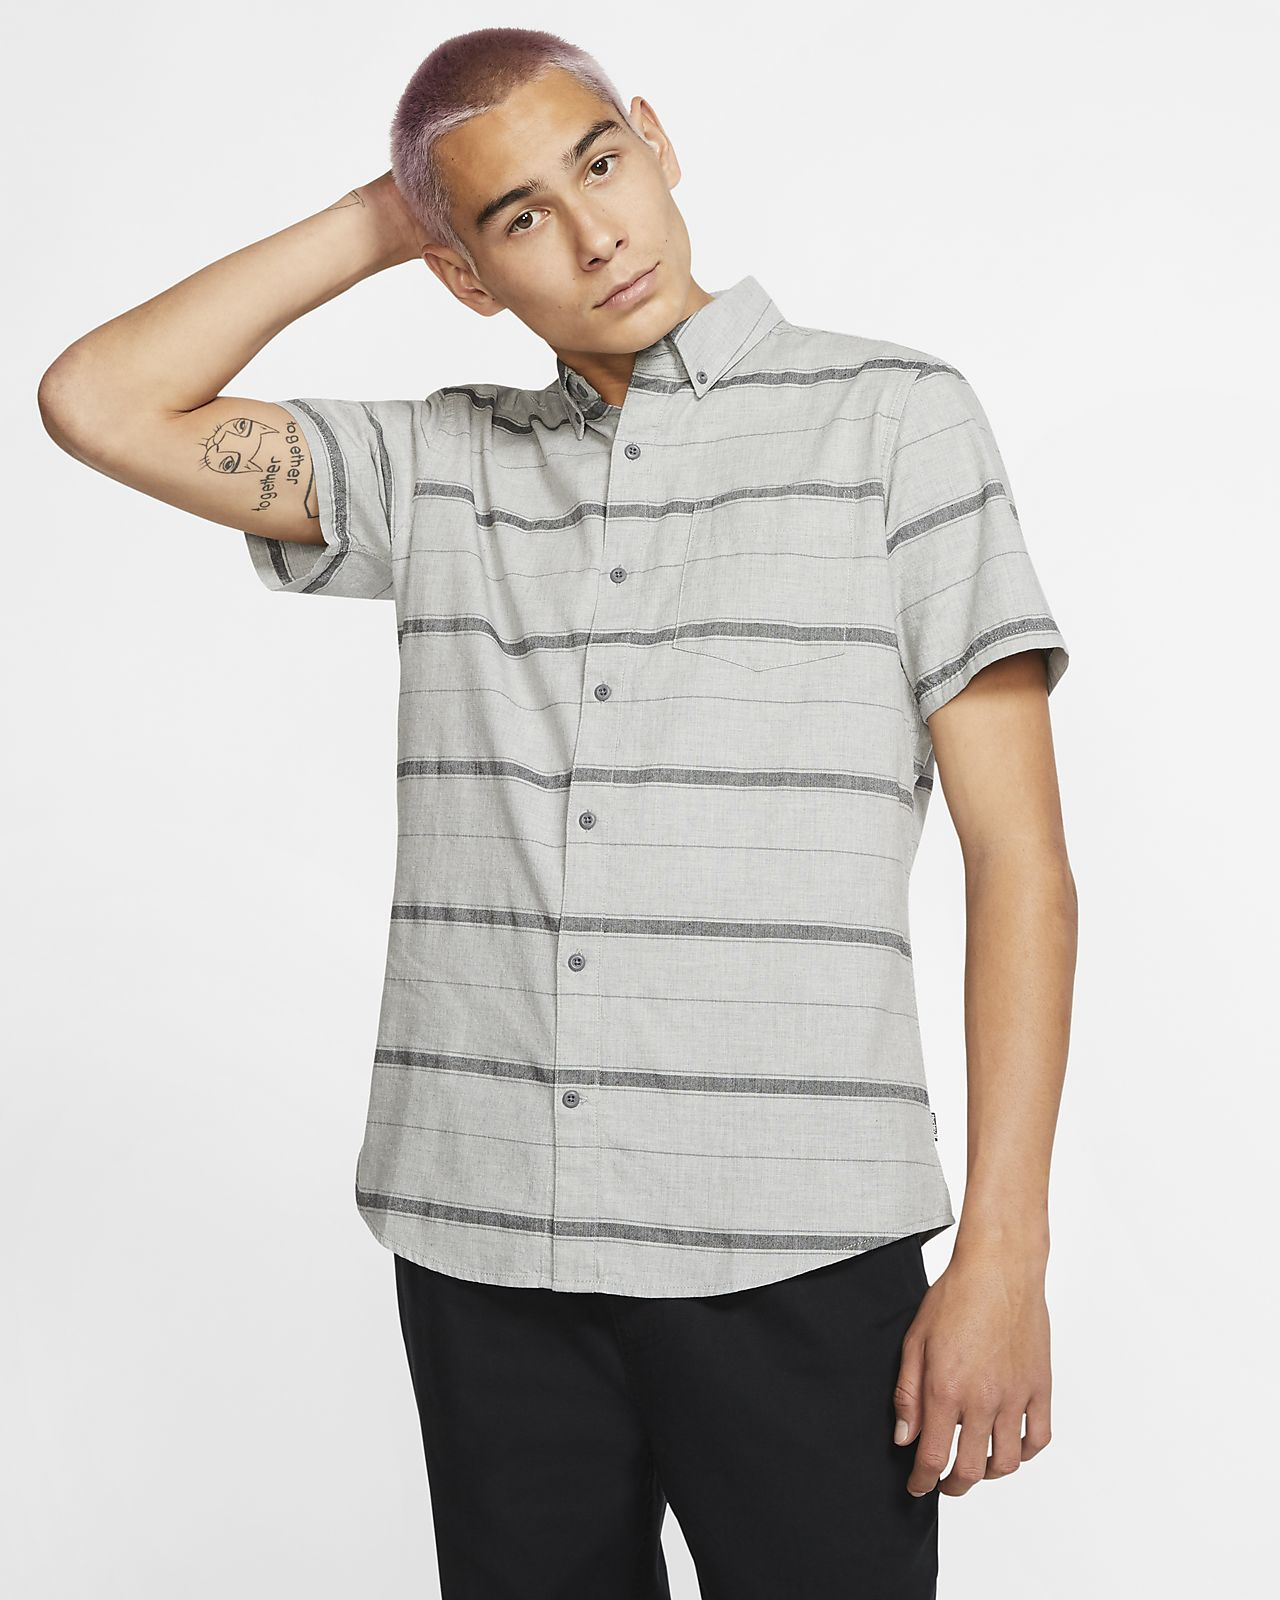 Kortärmad tröja Hurley Thompson Stretch för män